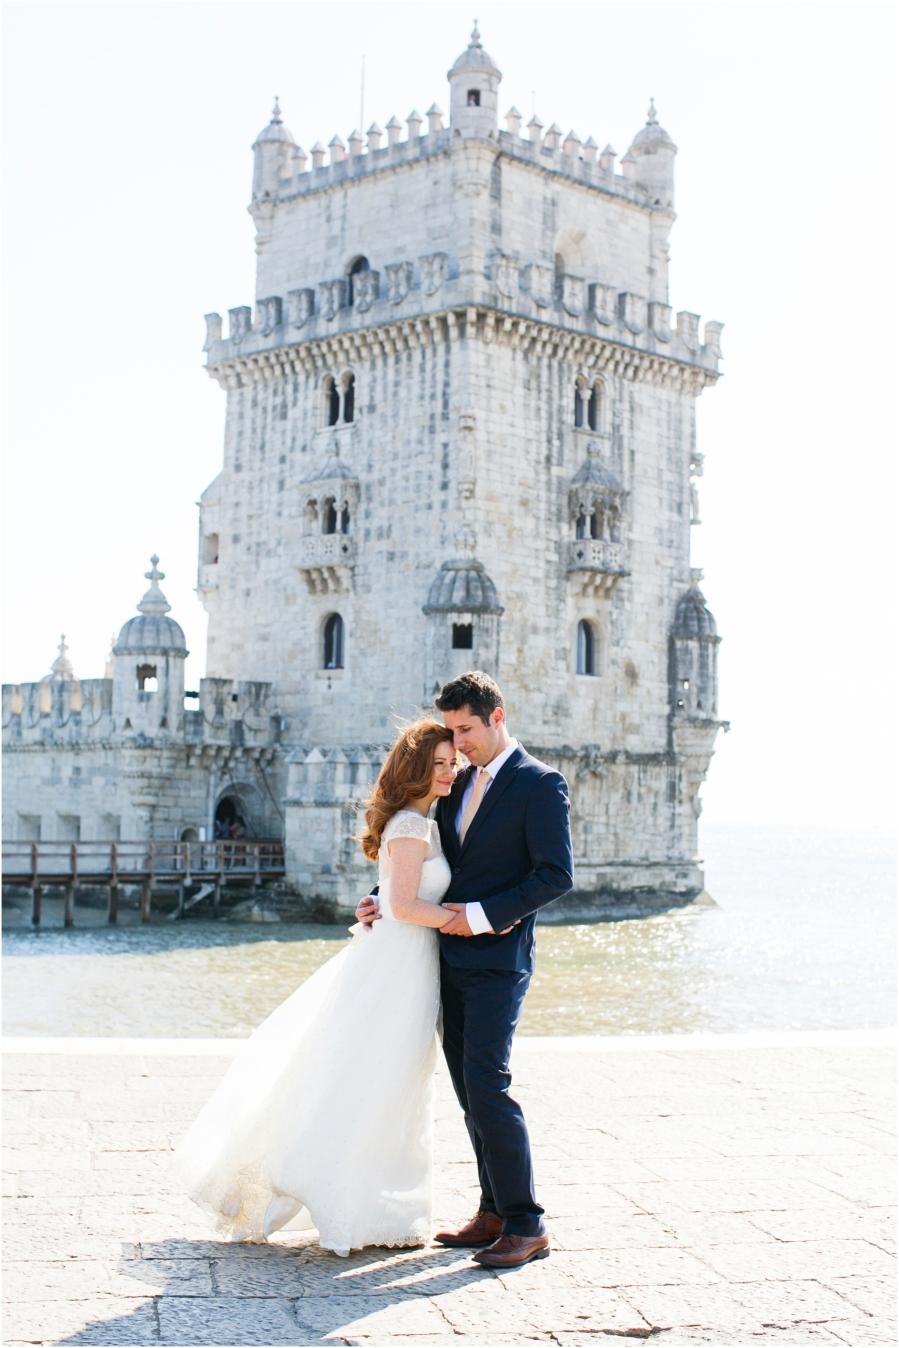 Bruno + Kaitlyn's Portugal Wedding Reception by Alea Lovely